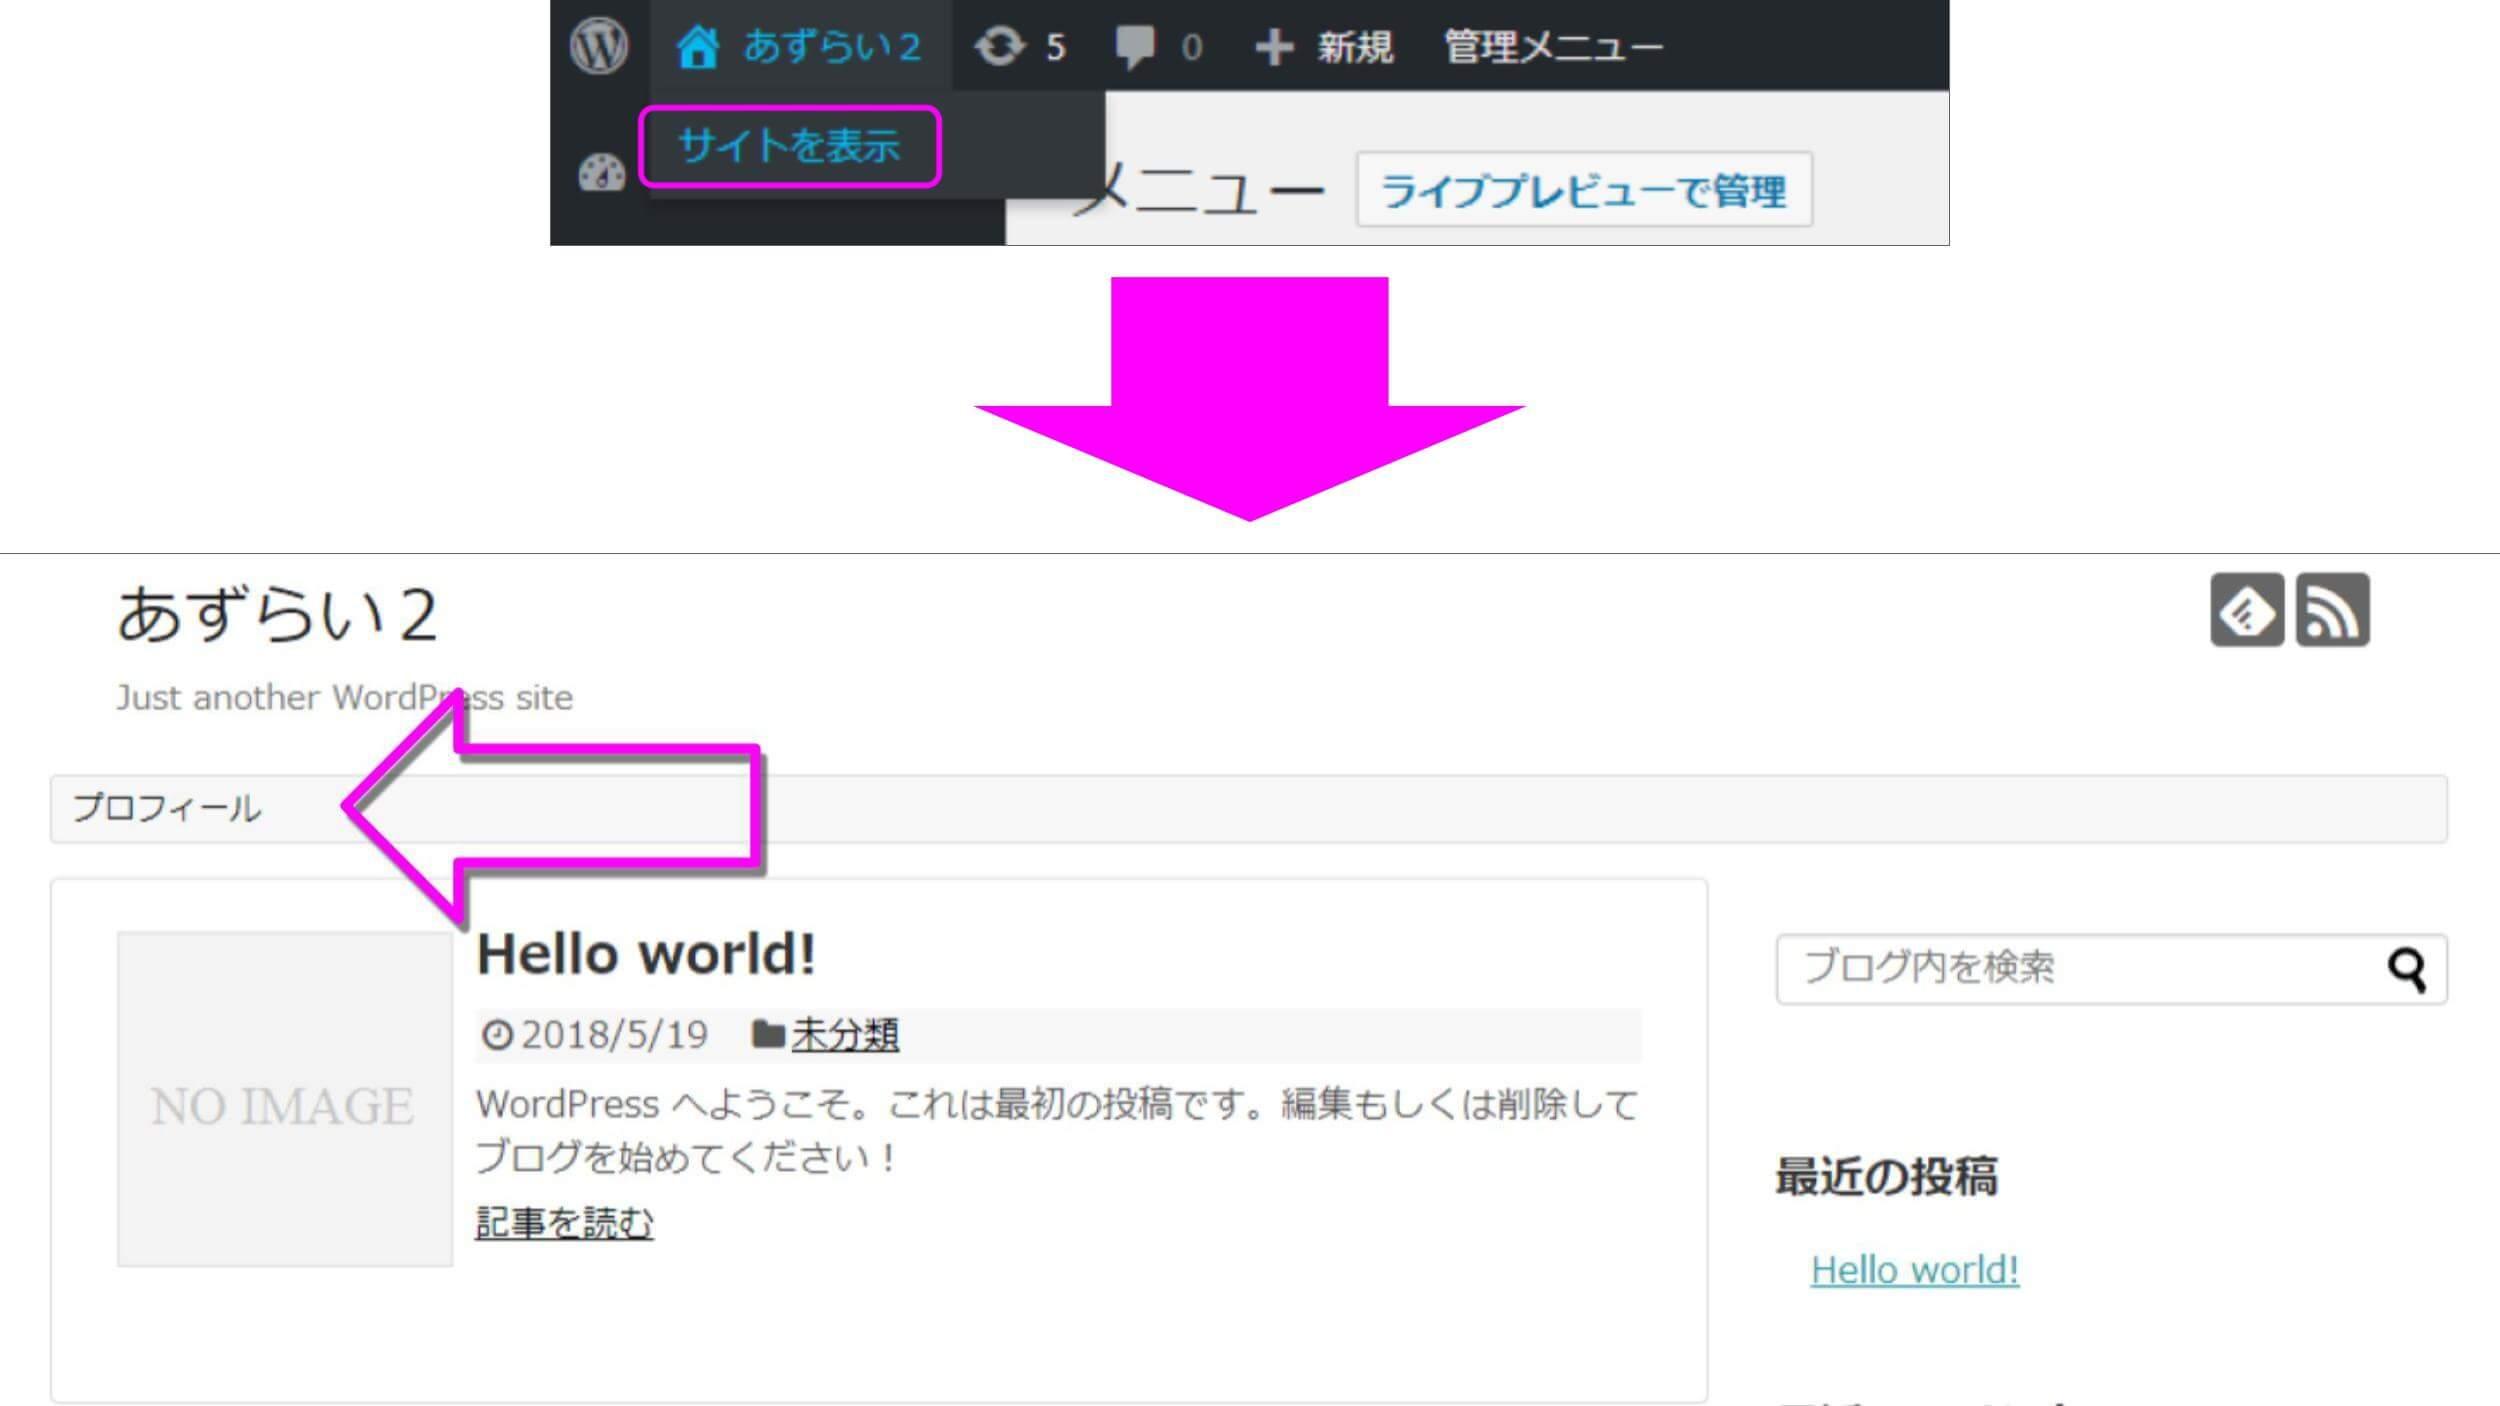 WordPress サイトを表示する手順